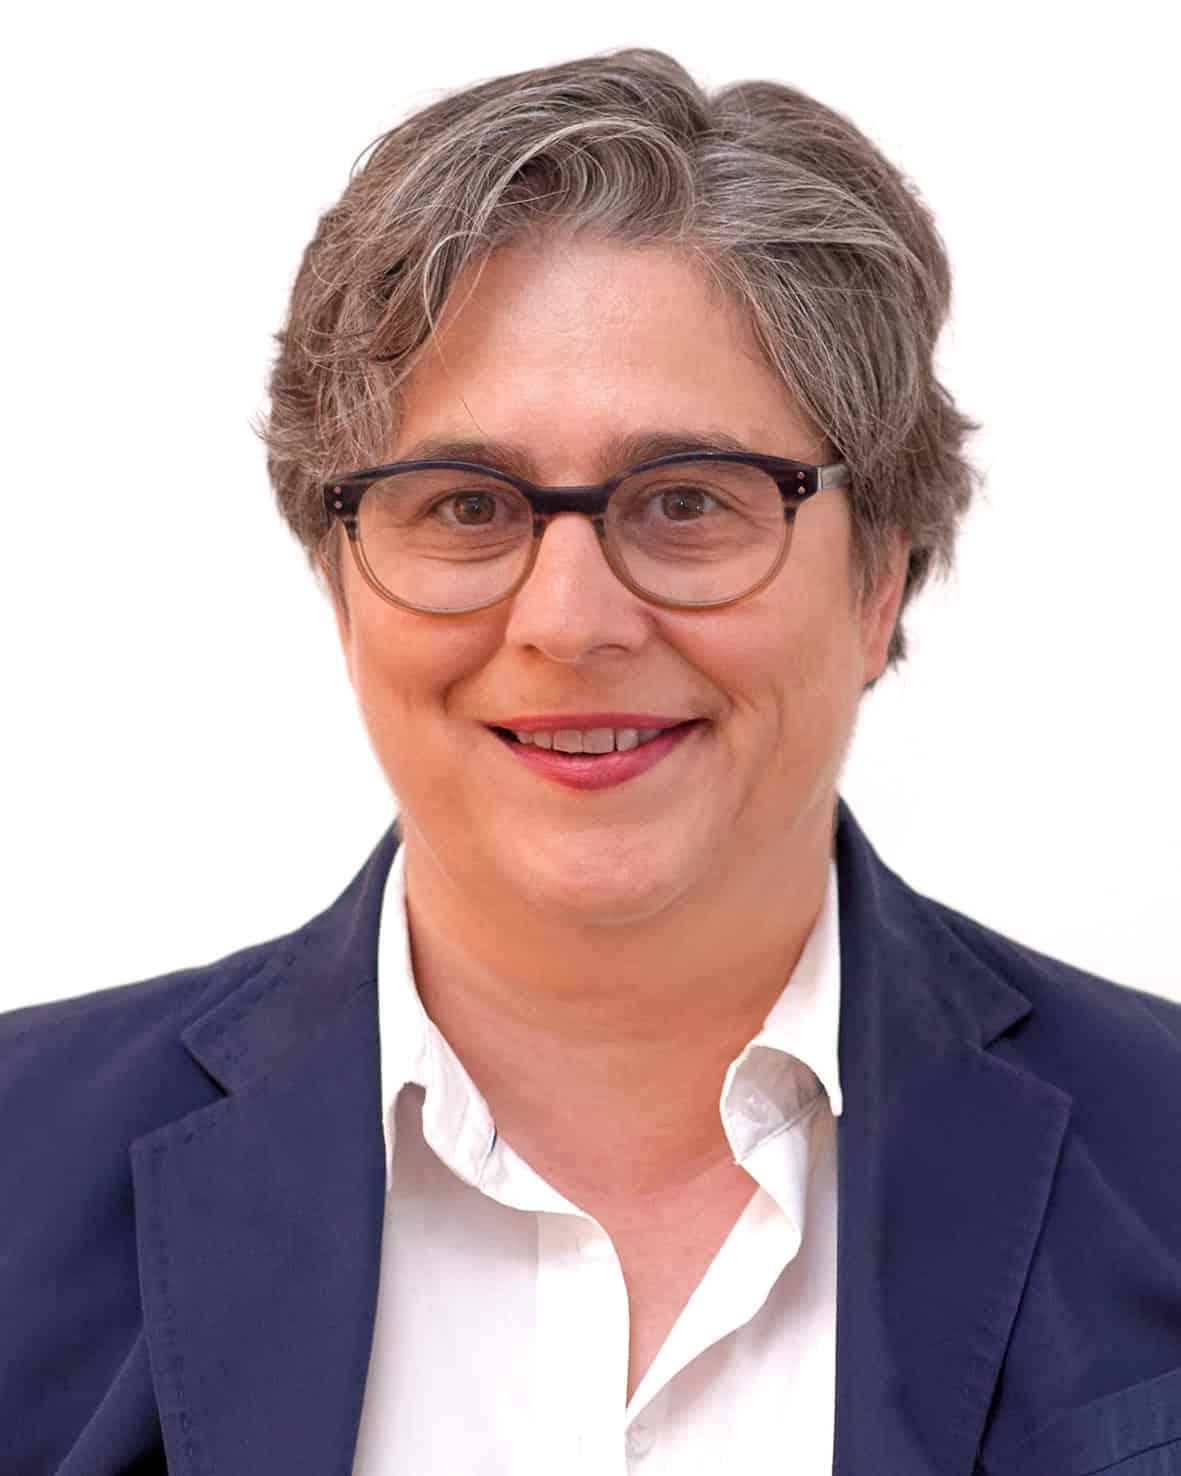 Rechtsanwältin Ulrike Silbermann ist Fachanwältin für Familienrecht und Fachanwältin für Verkehrsrecht